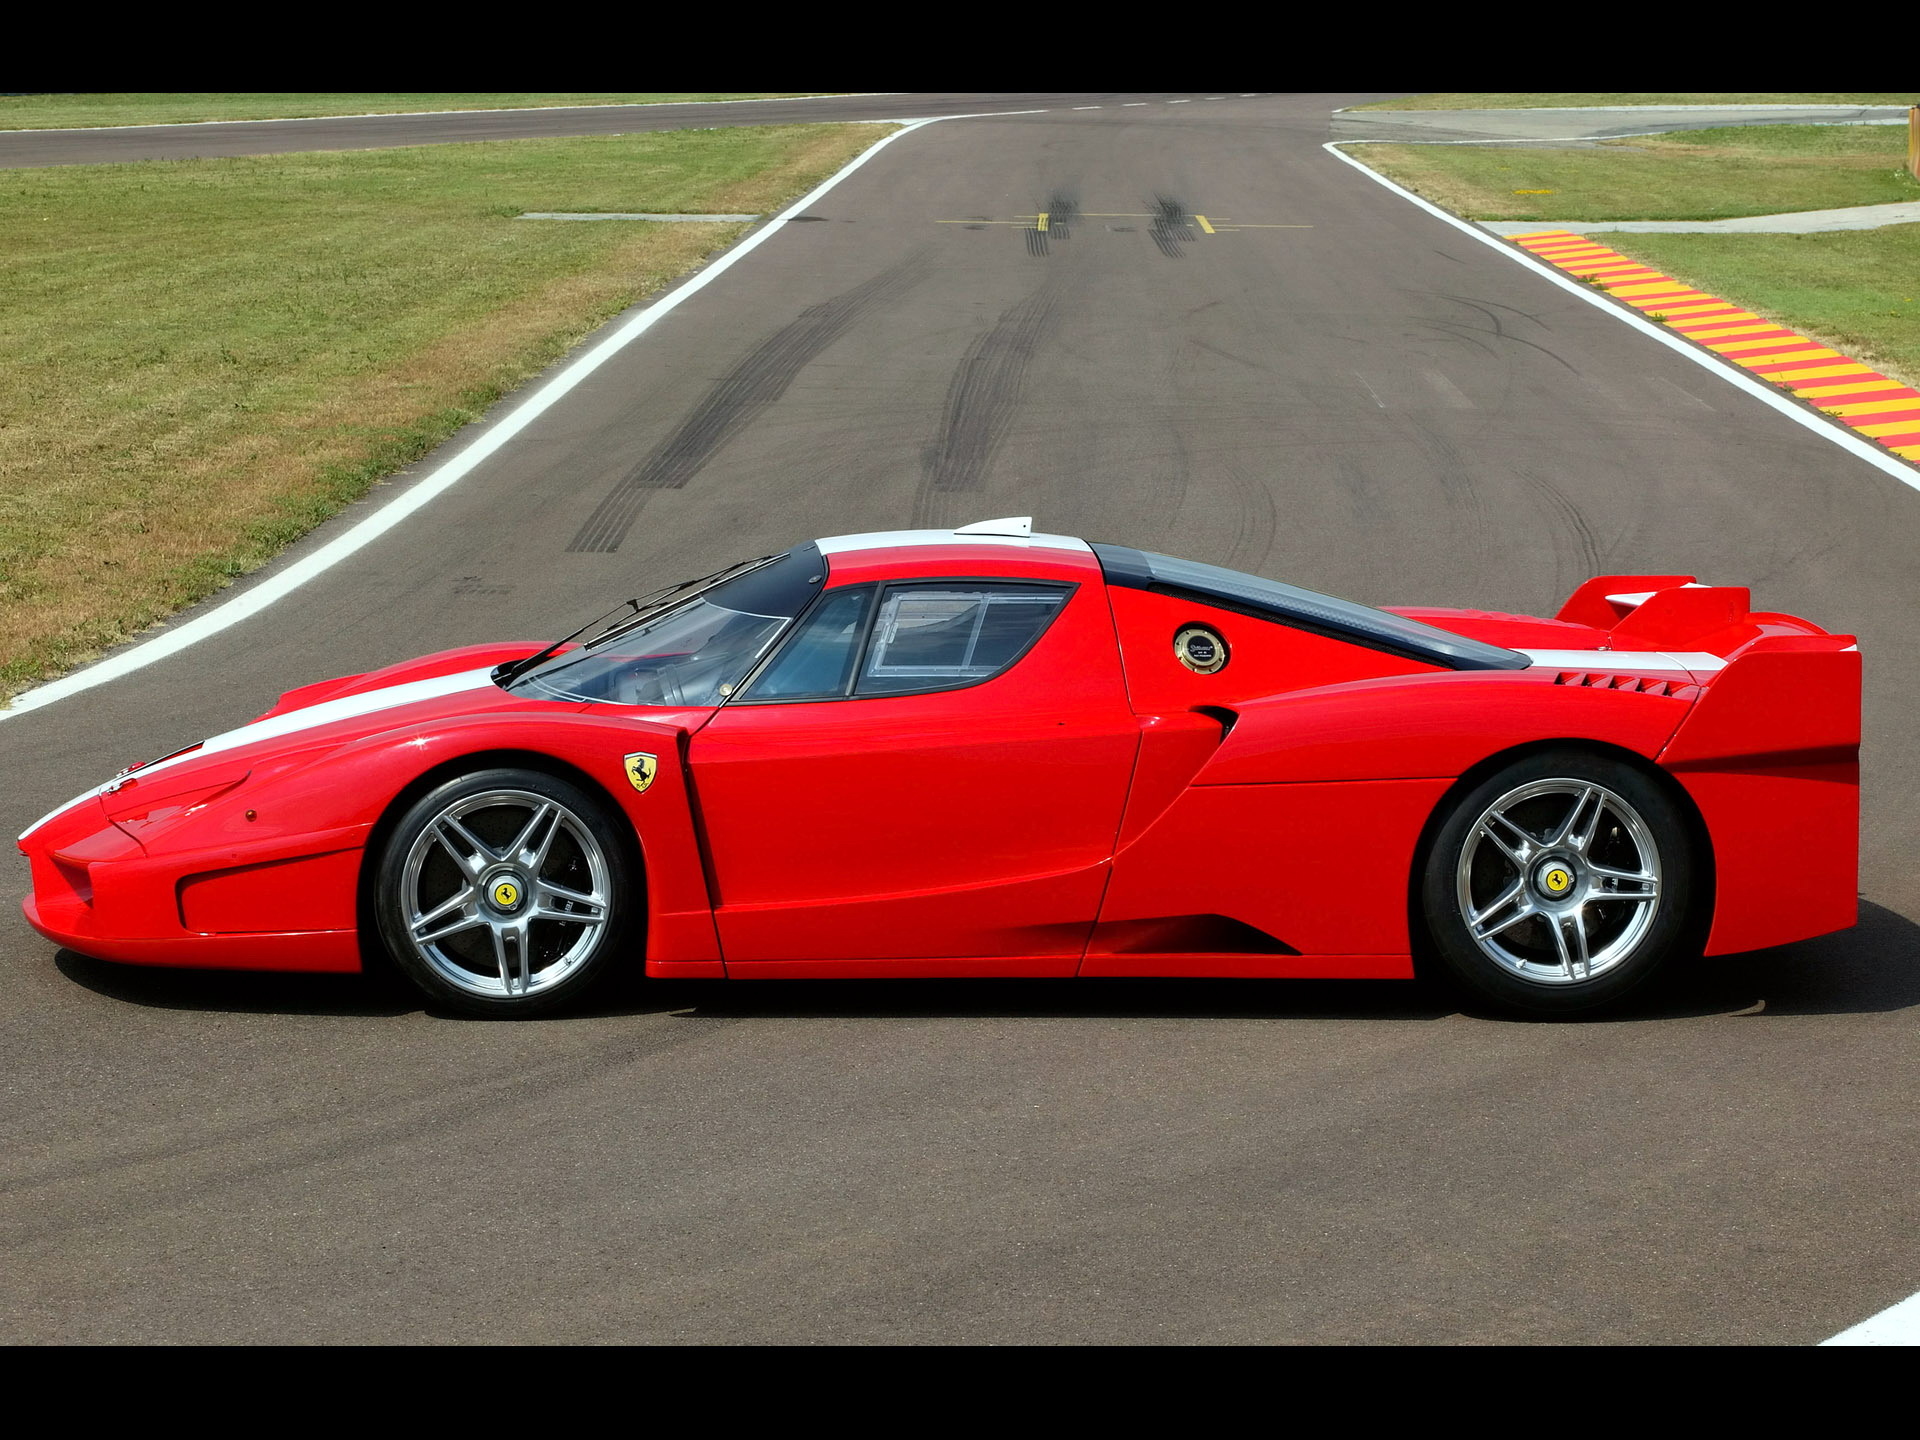 Racing Cars Ferrari Fxx Red 645016 Wallpaper wallpaper